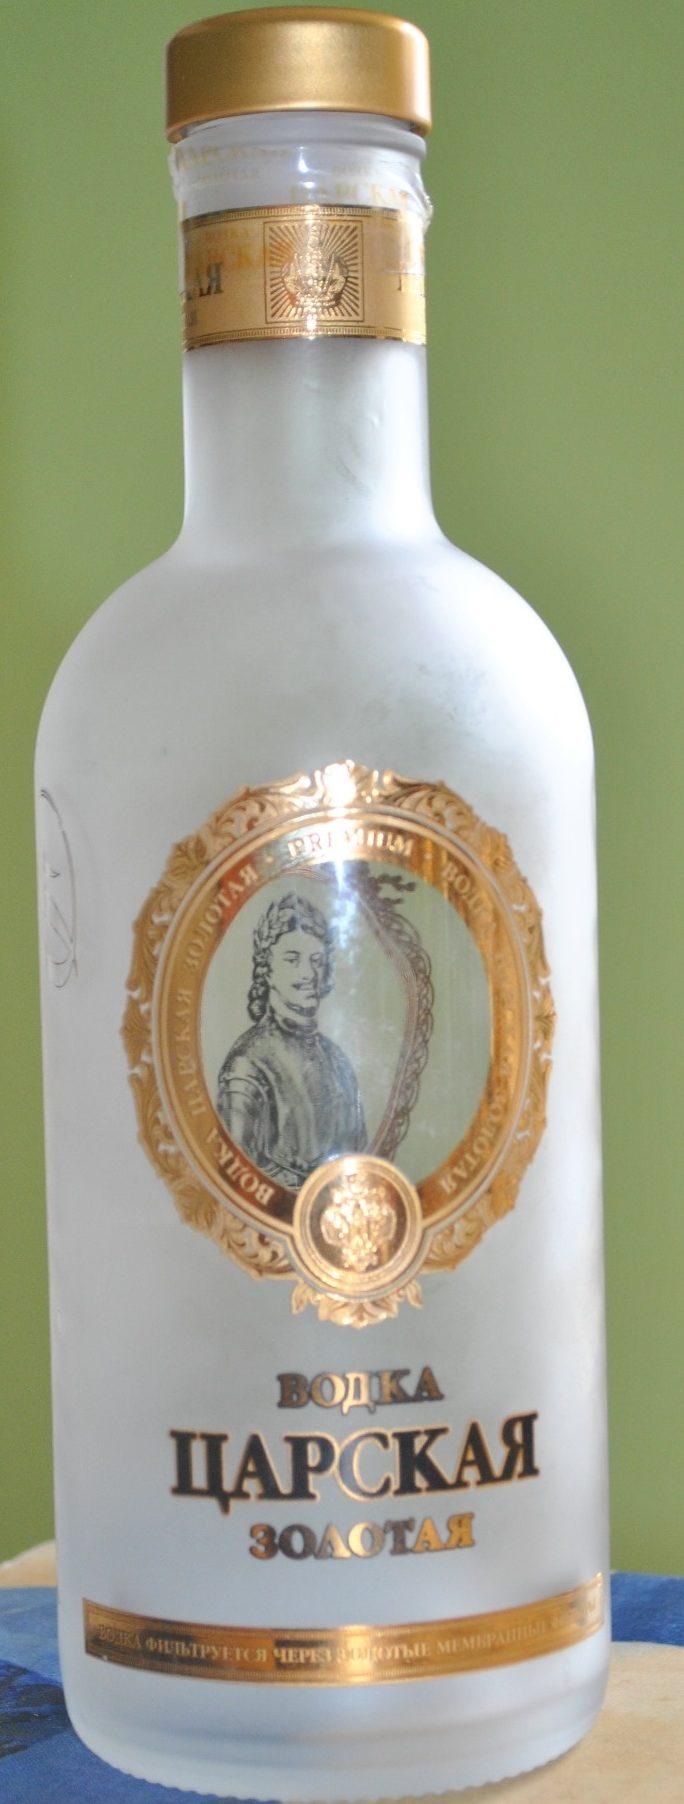 "Wodka ""zarskaja Solotaja"" 0,5 L, - Produit - fr"